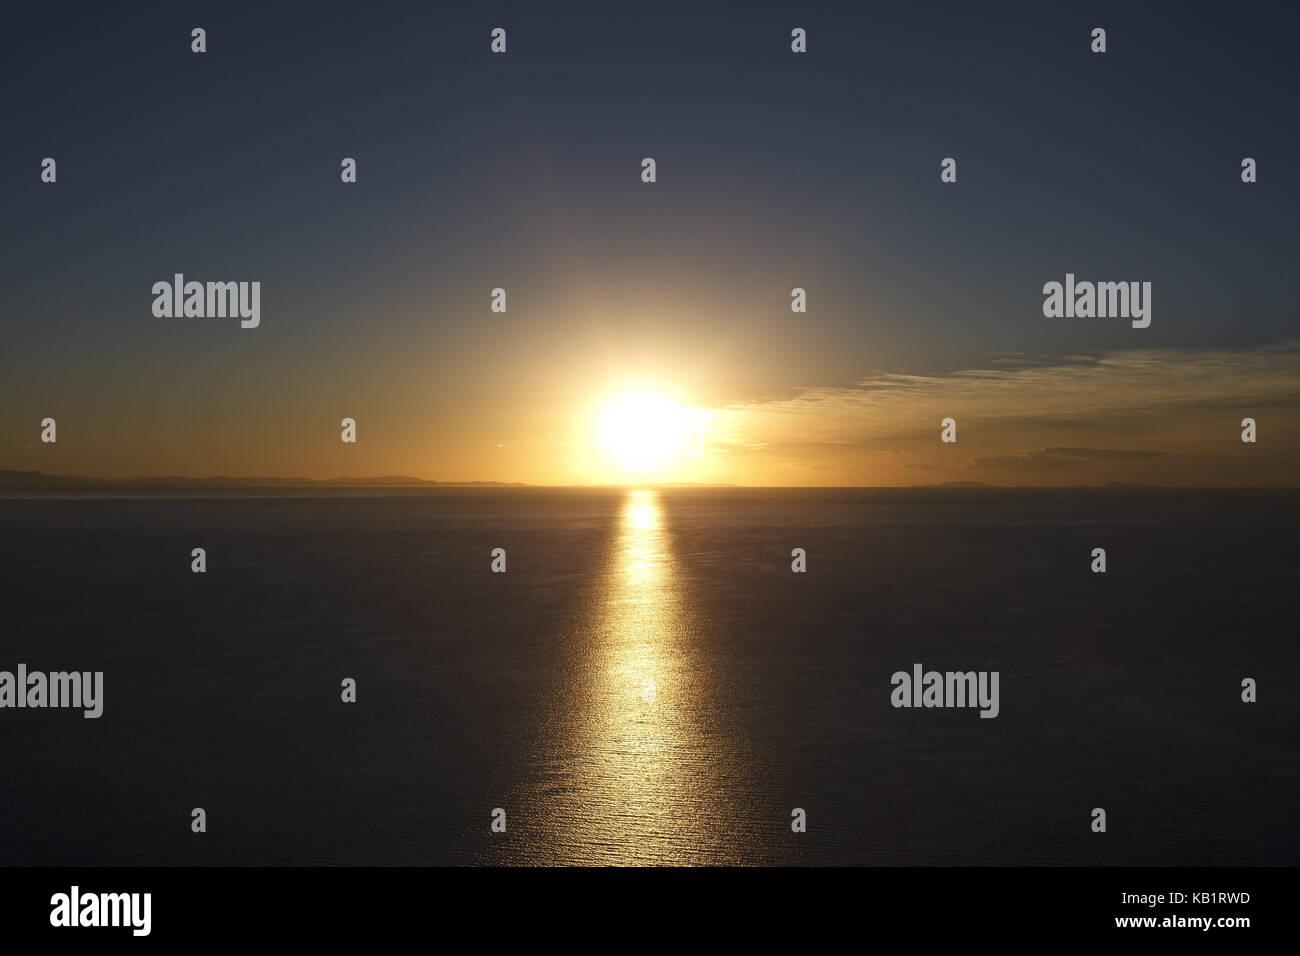 Bolivia, Titicacasee, Copacabana, sundown, - Stock Image